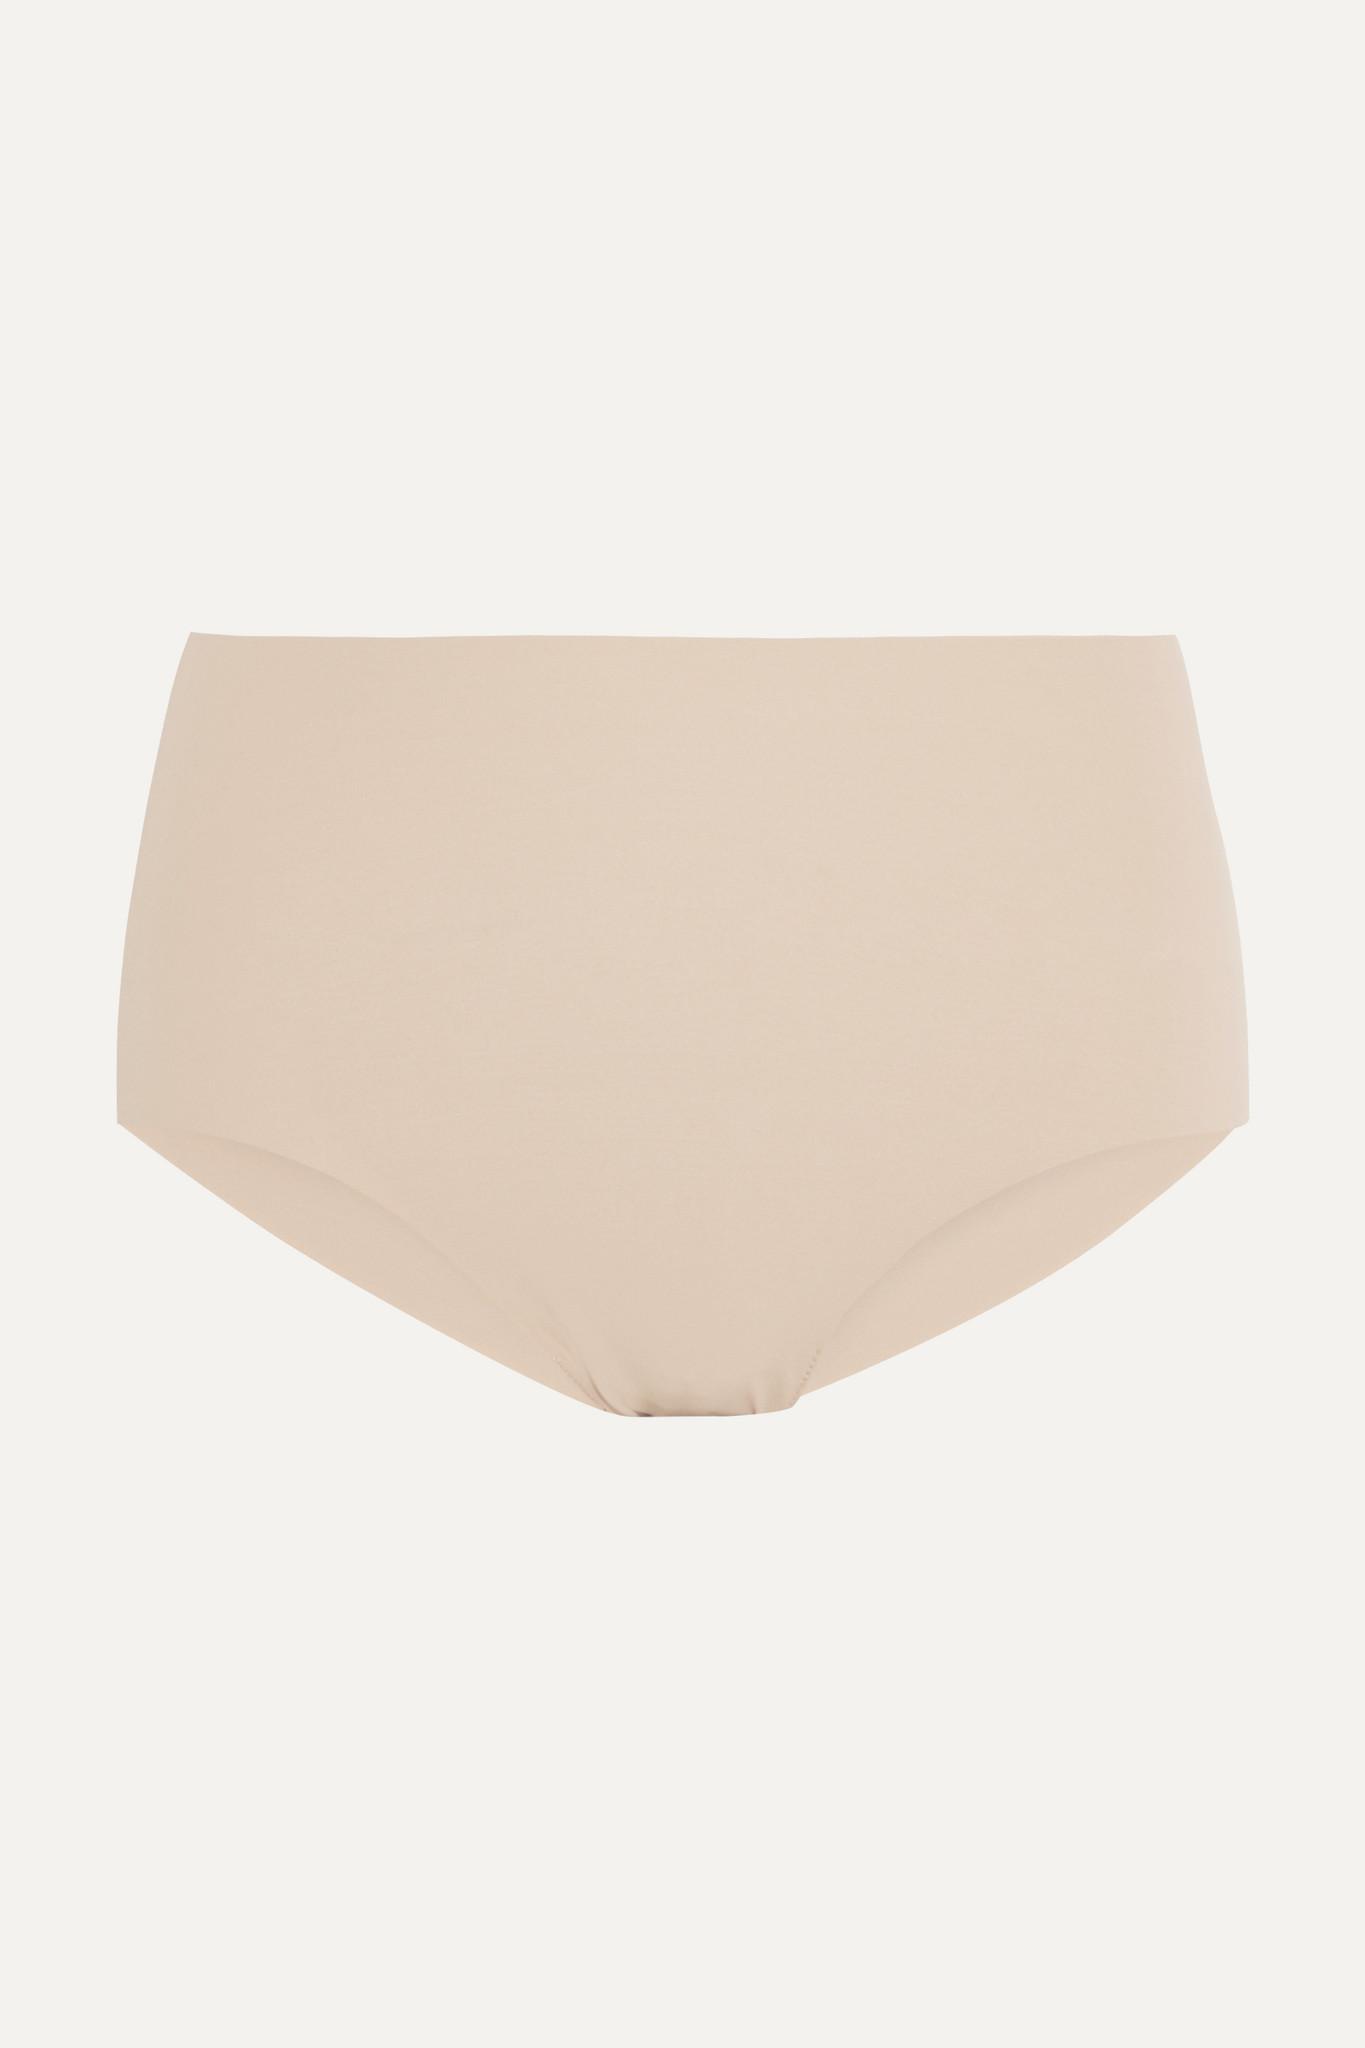 COMMANDO - 高腰弹力三角裤 - 中性色 - M/L